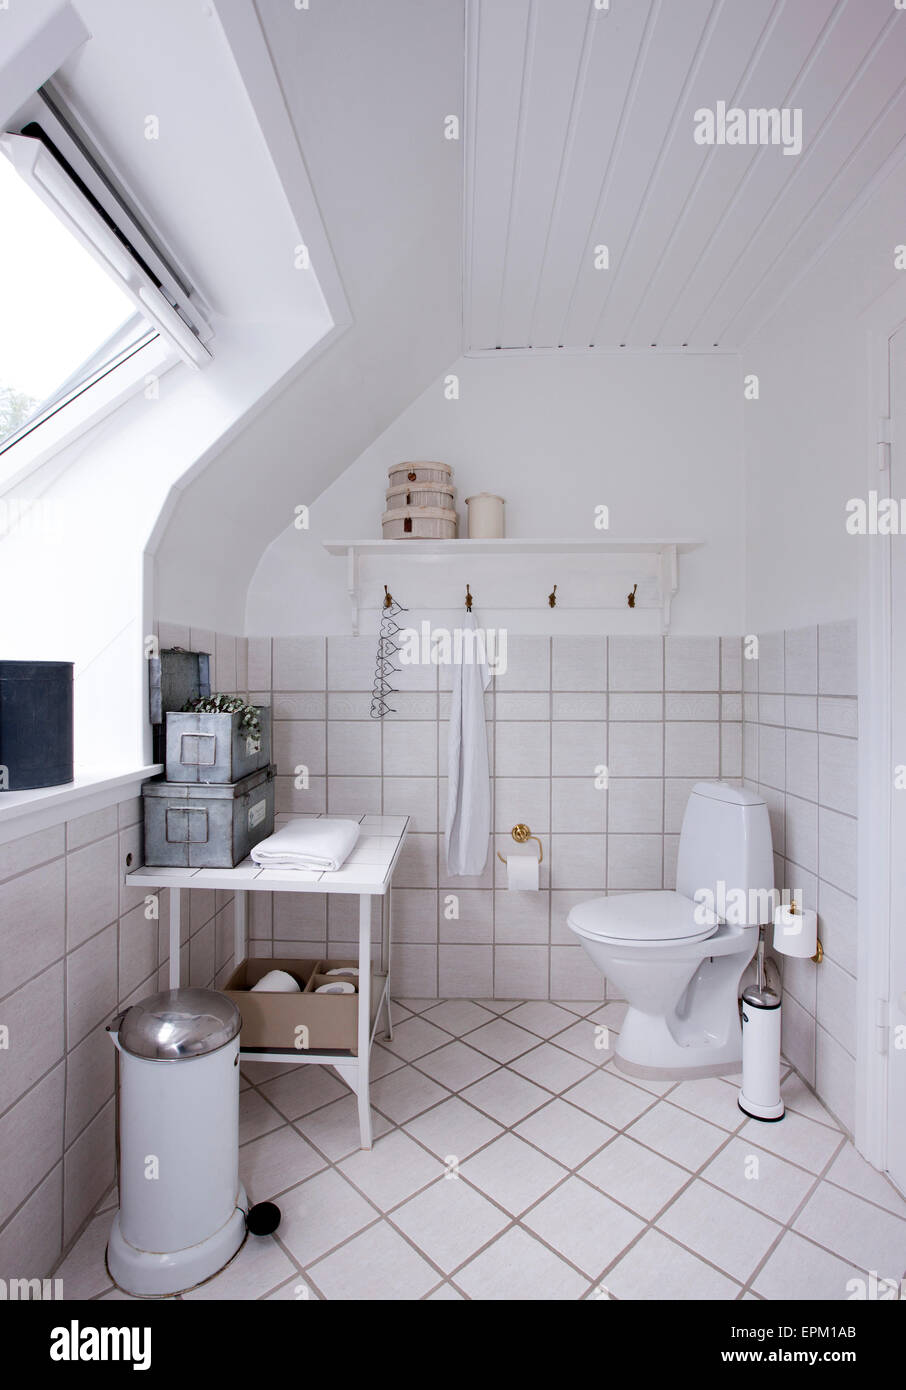 Tiled bathroom with dormer window in Hanne Davidsen home renovation ...